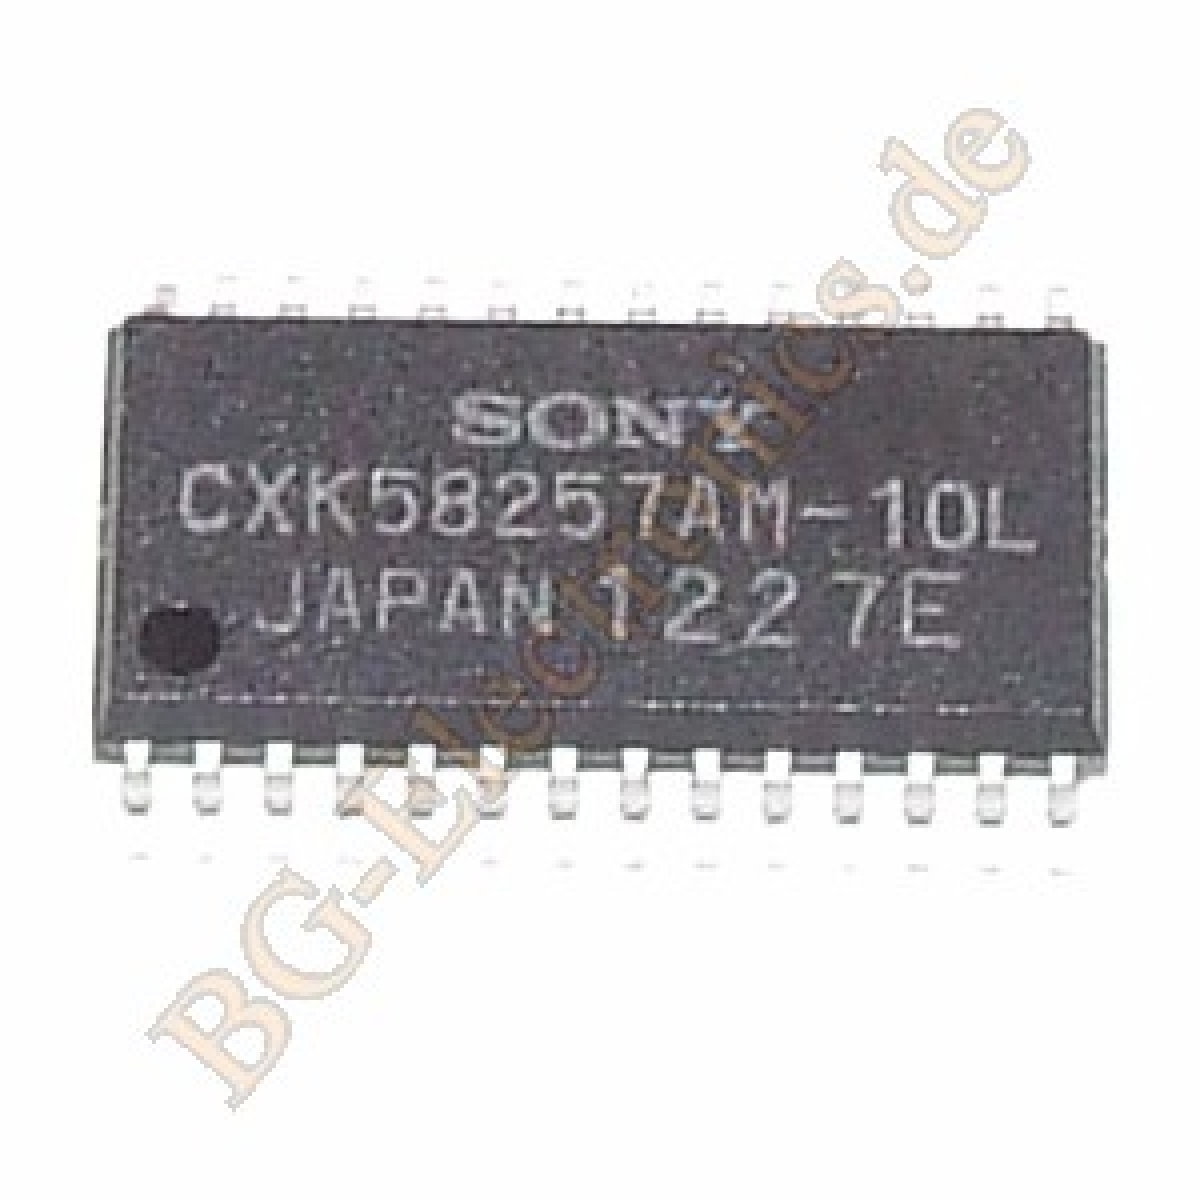 1 x CXK58257AM-10L 32768-Word x 8-BIT HIGH SPEED CMOS STATIC  Sony SO-28 1pcs